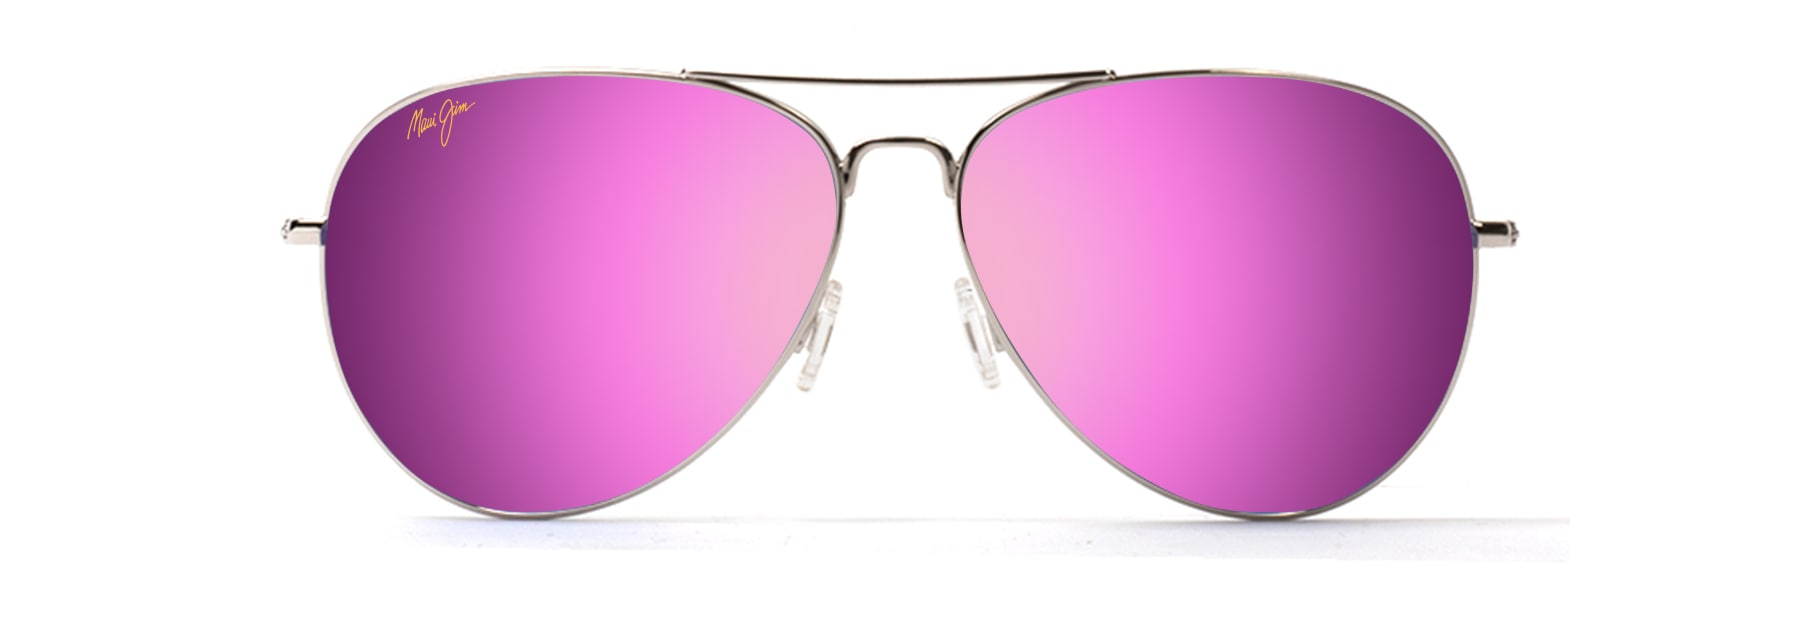 Custom Mavericks Polarized Sunglasses | Maui Jim®